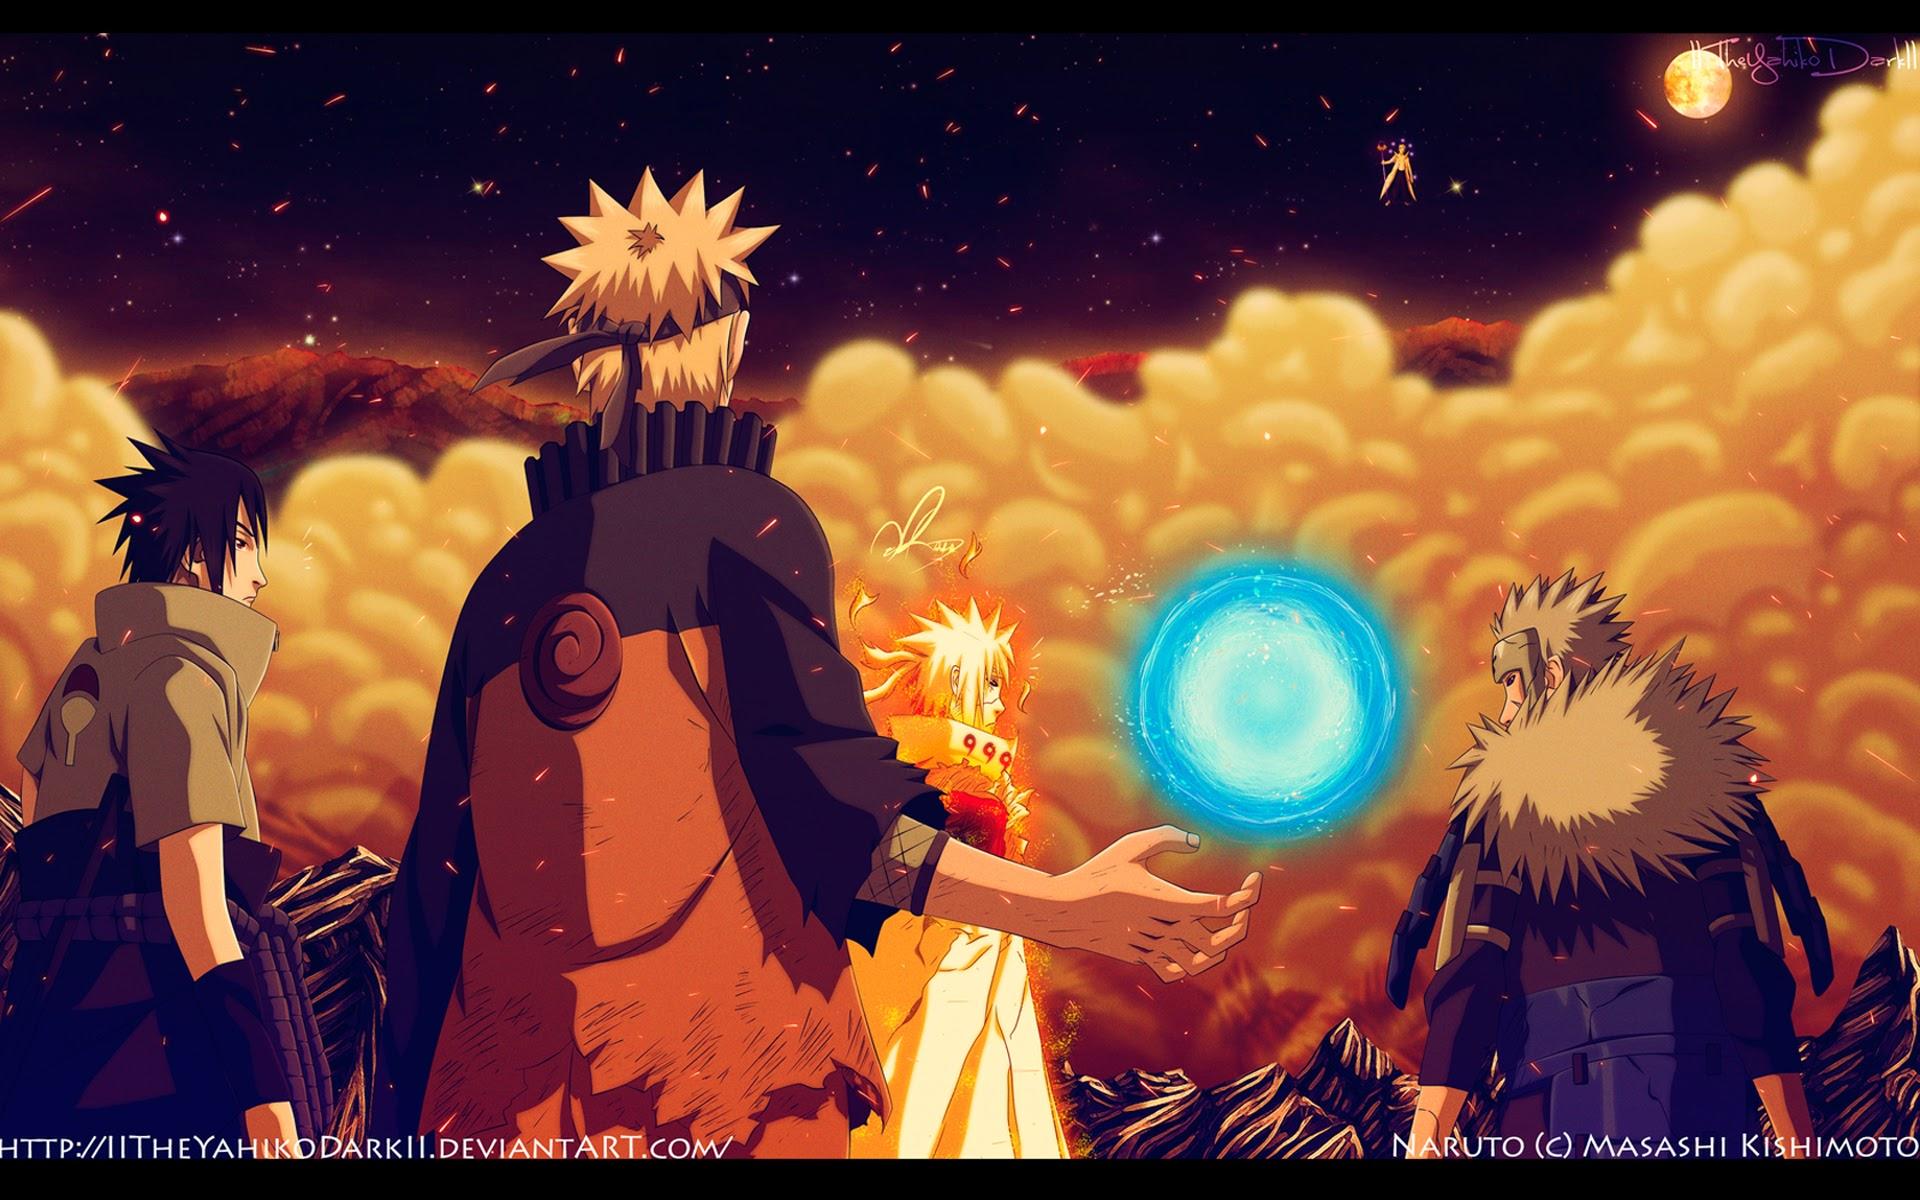 naruto rasengan tobirama senju minato sasuke vs obito hd anime 1920x1200